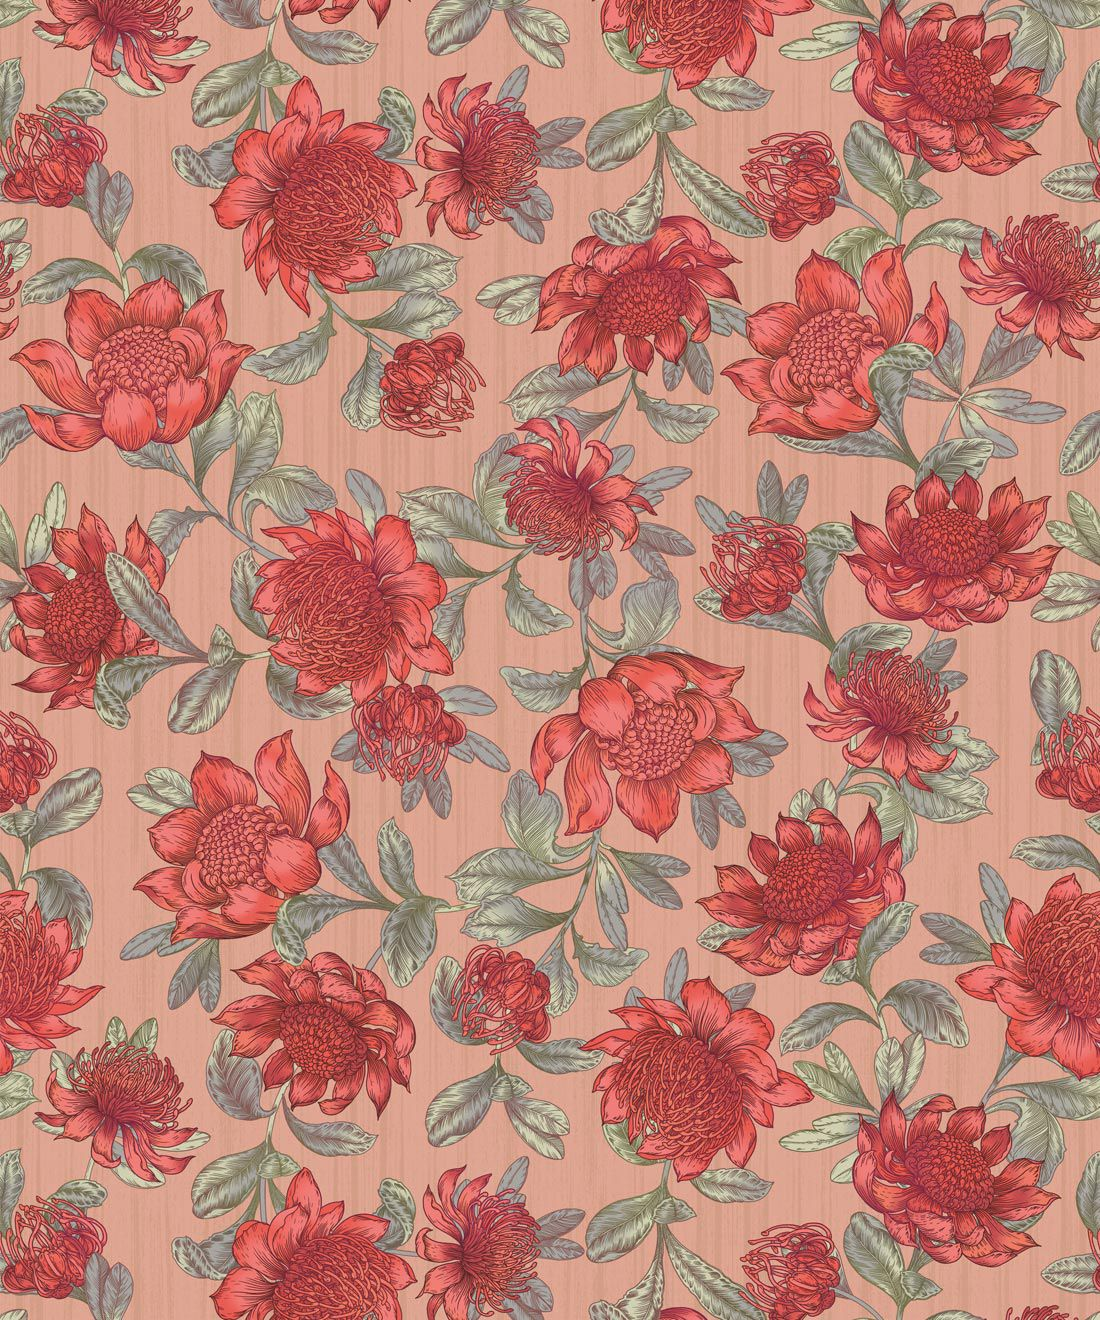 Waratah Wallpaper • Eloise Short • Vintage Floral Wallpaper •Granny Chic Wallpaper • Grandmillennial Style Wallpaper •Blush •Swatch